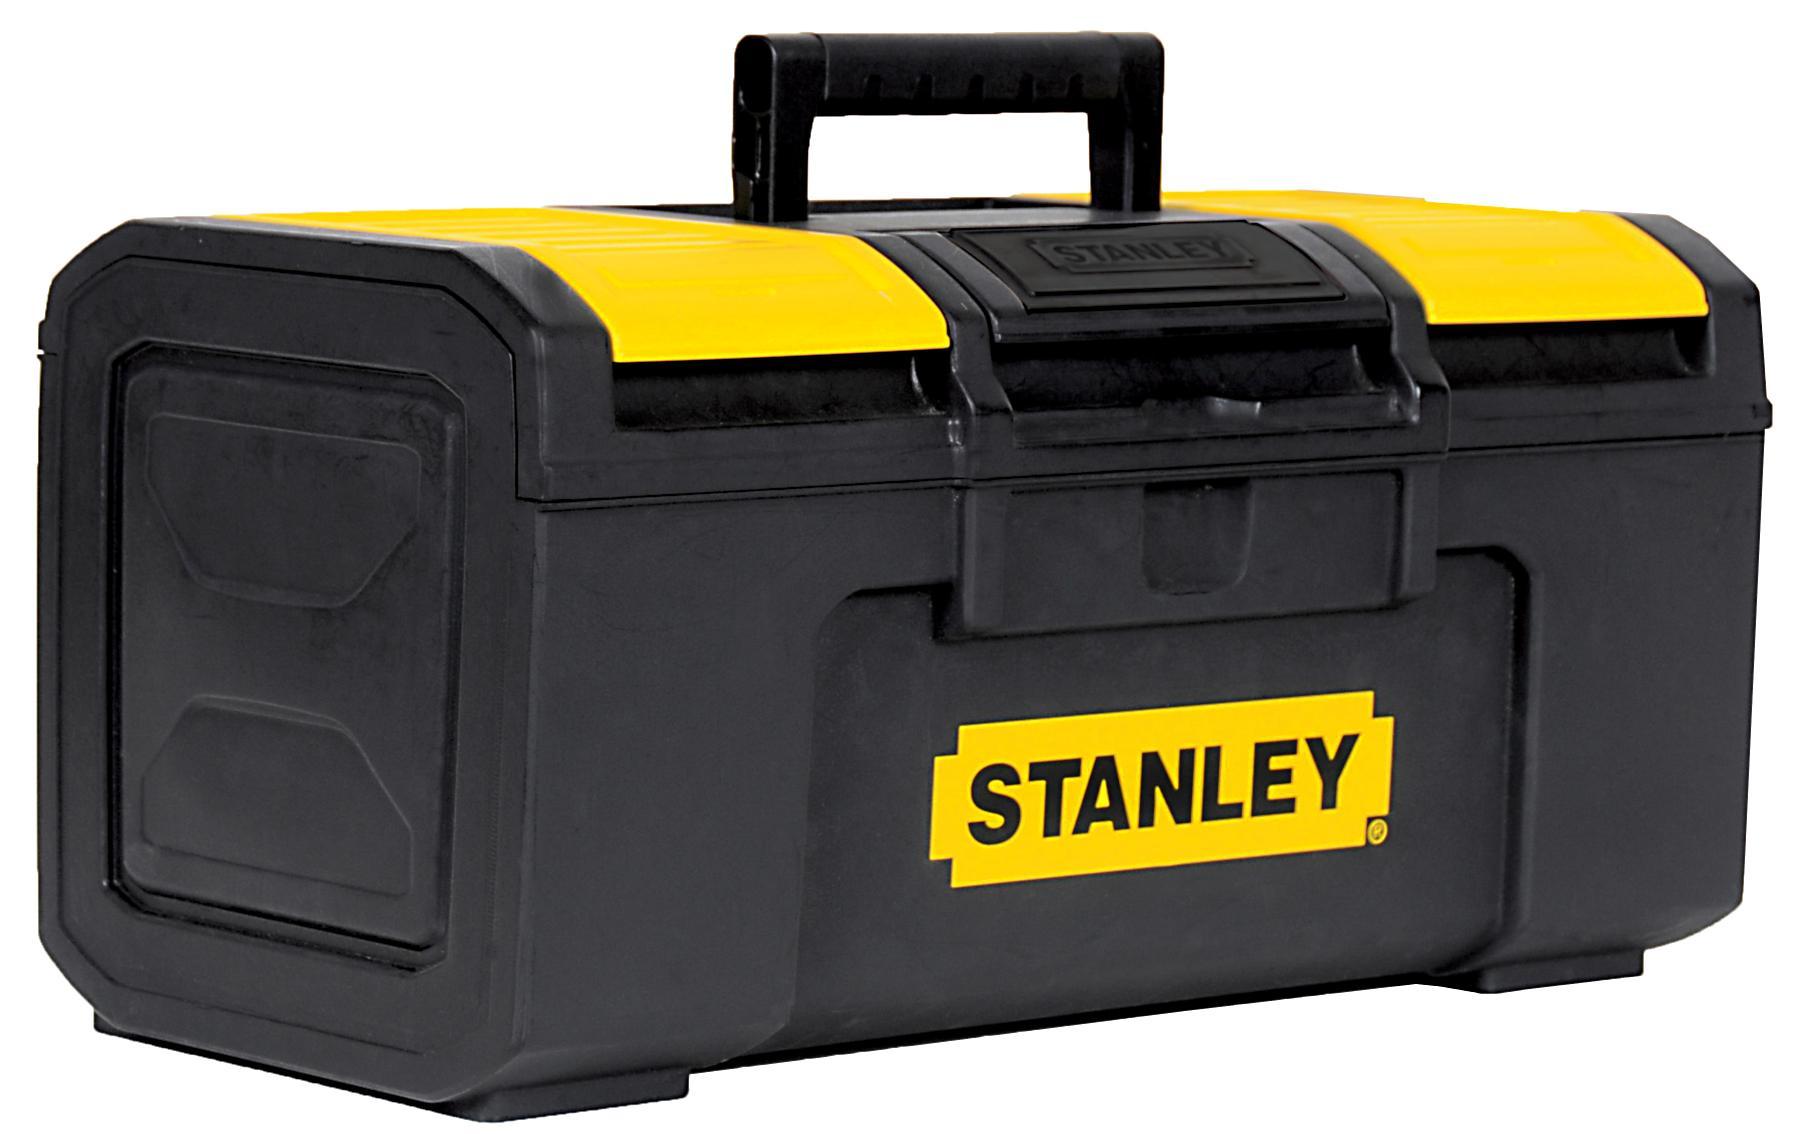 Line Toolbox ящик для инструментов truper т 15320